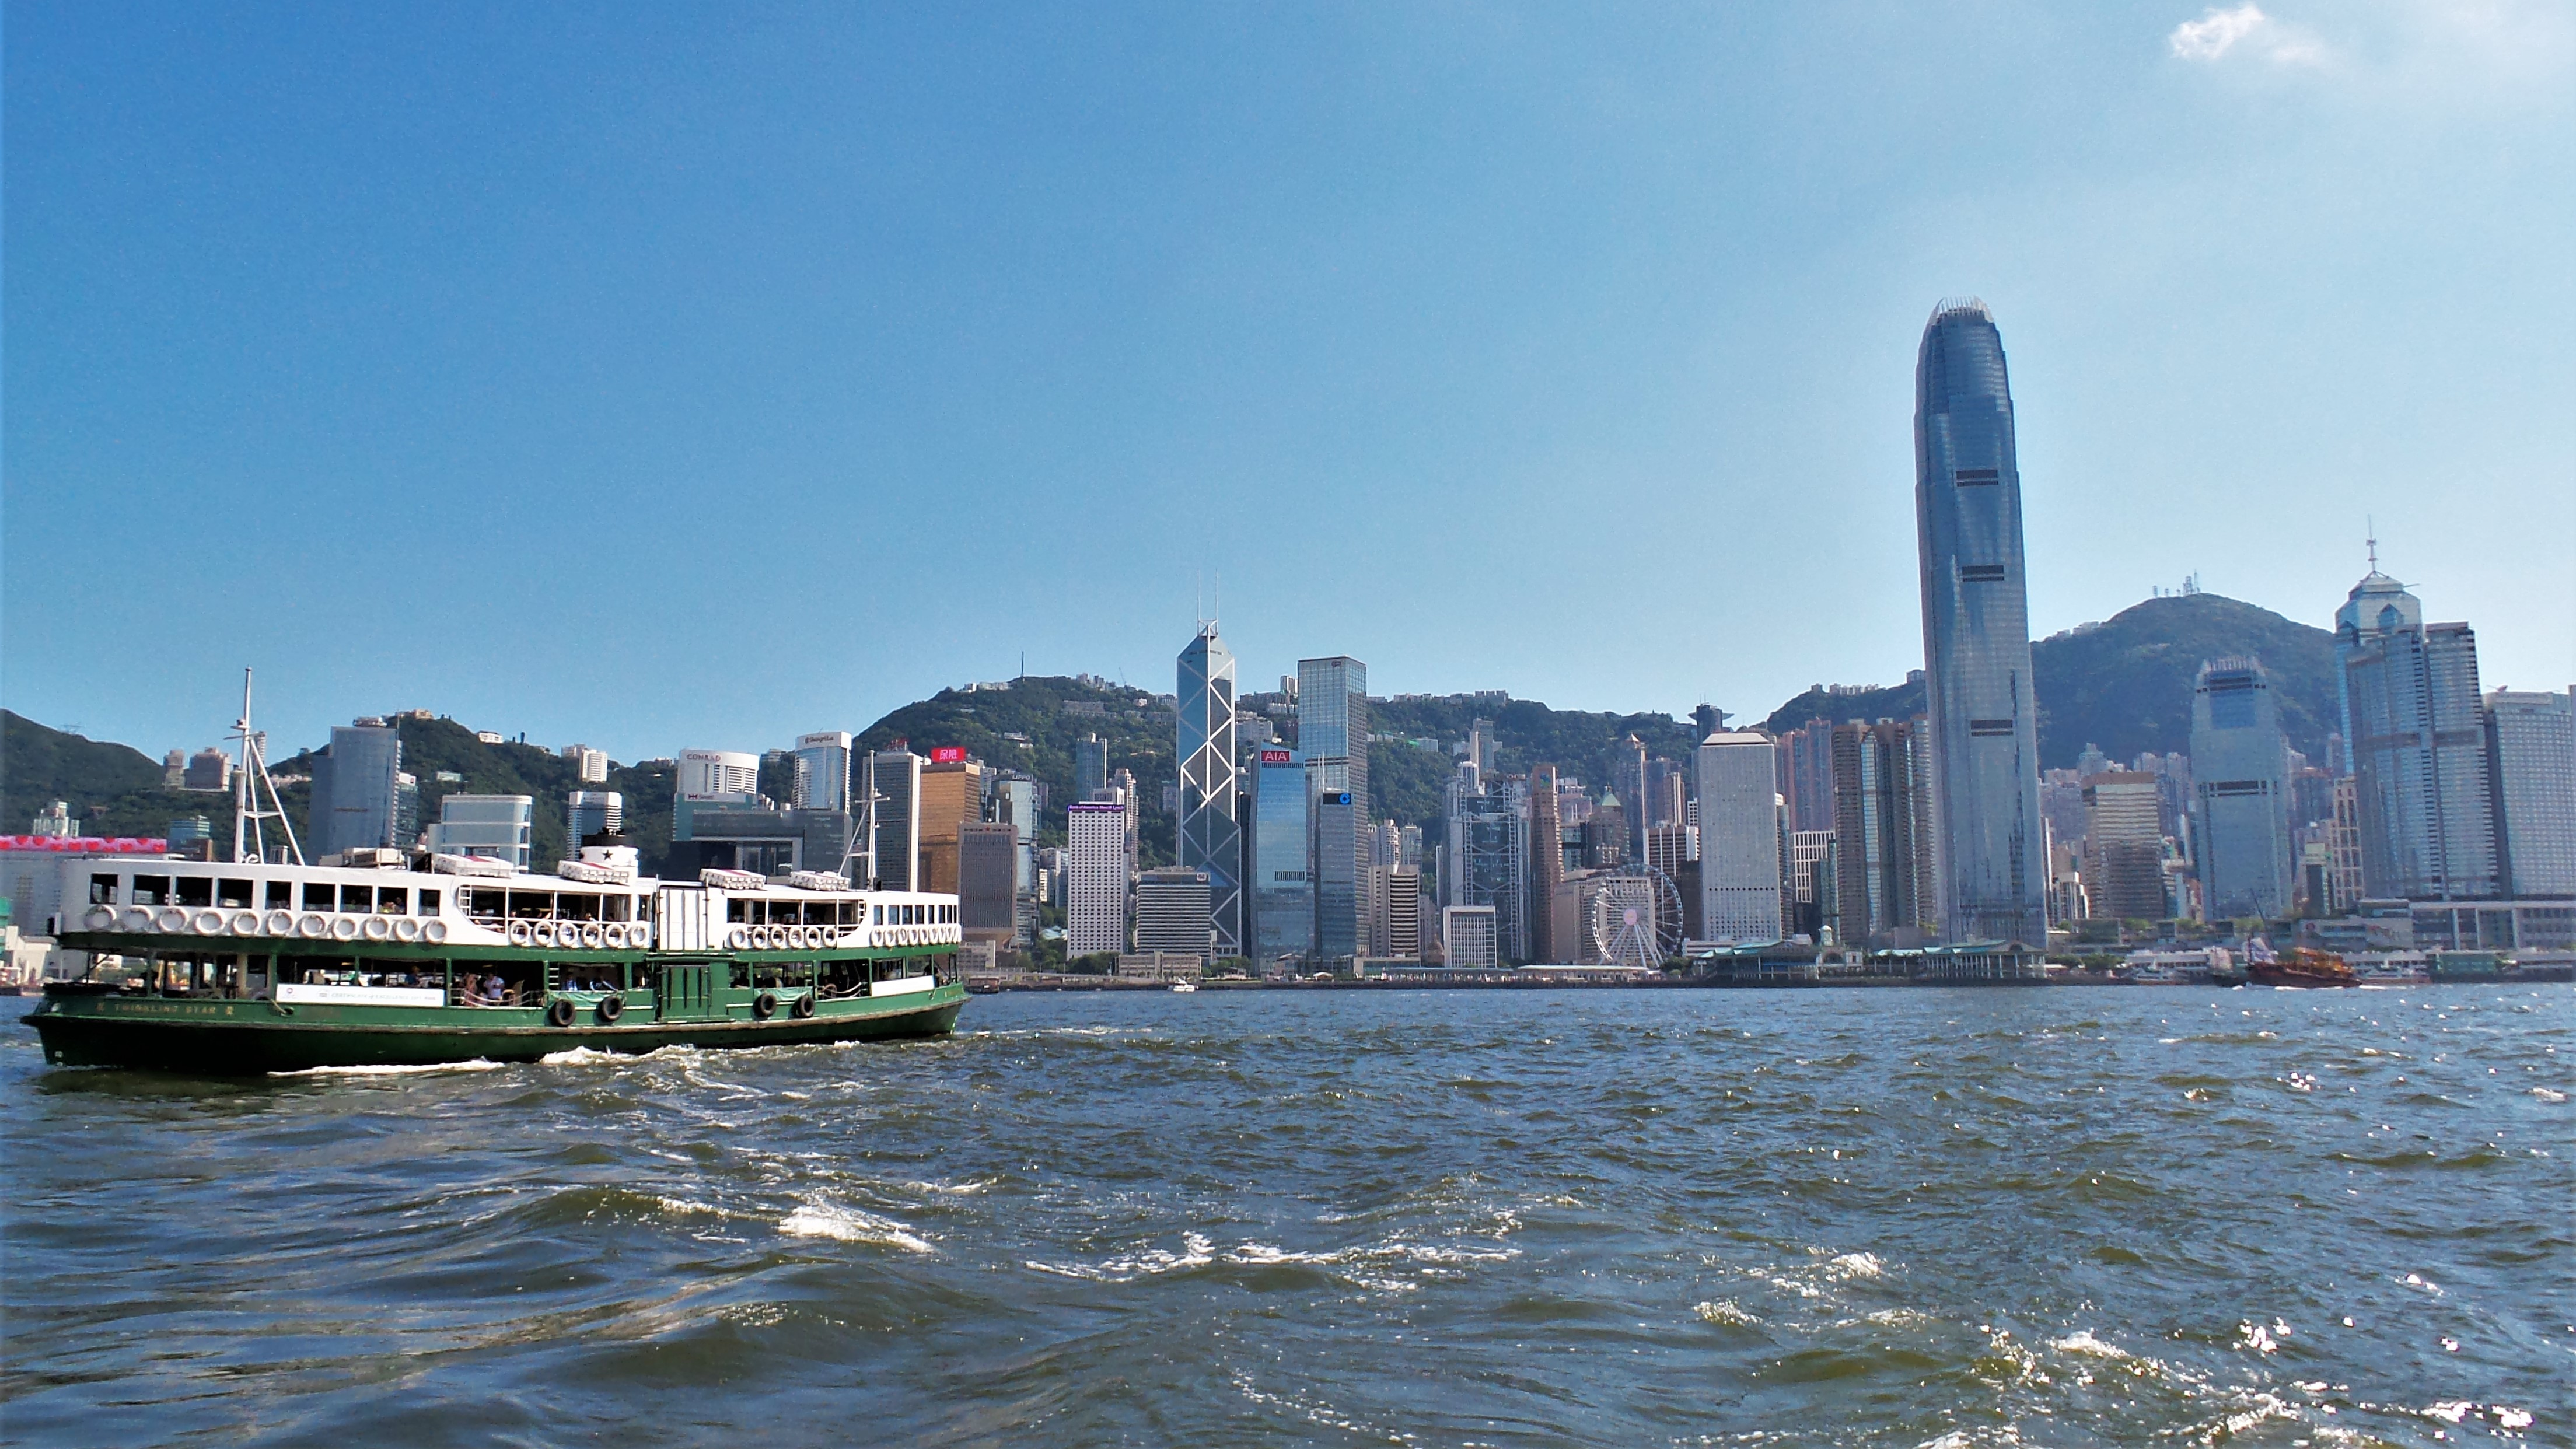 Star Ferry von Kwoloon nach Hong Kong Island